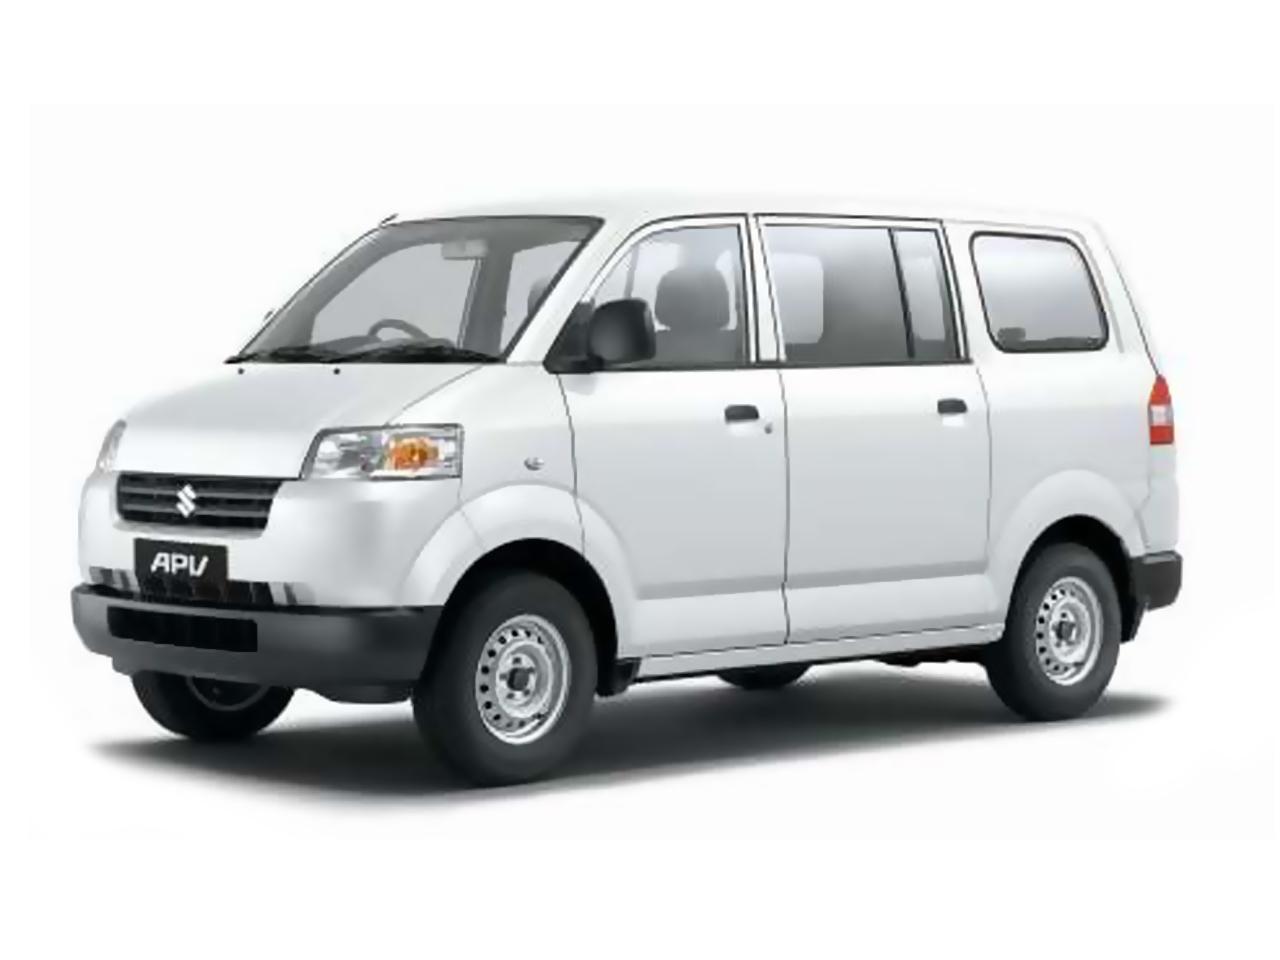 2018 Suzuki Apv Prices In Uae Gulf Specs Reviews For Dubai Abu